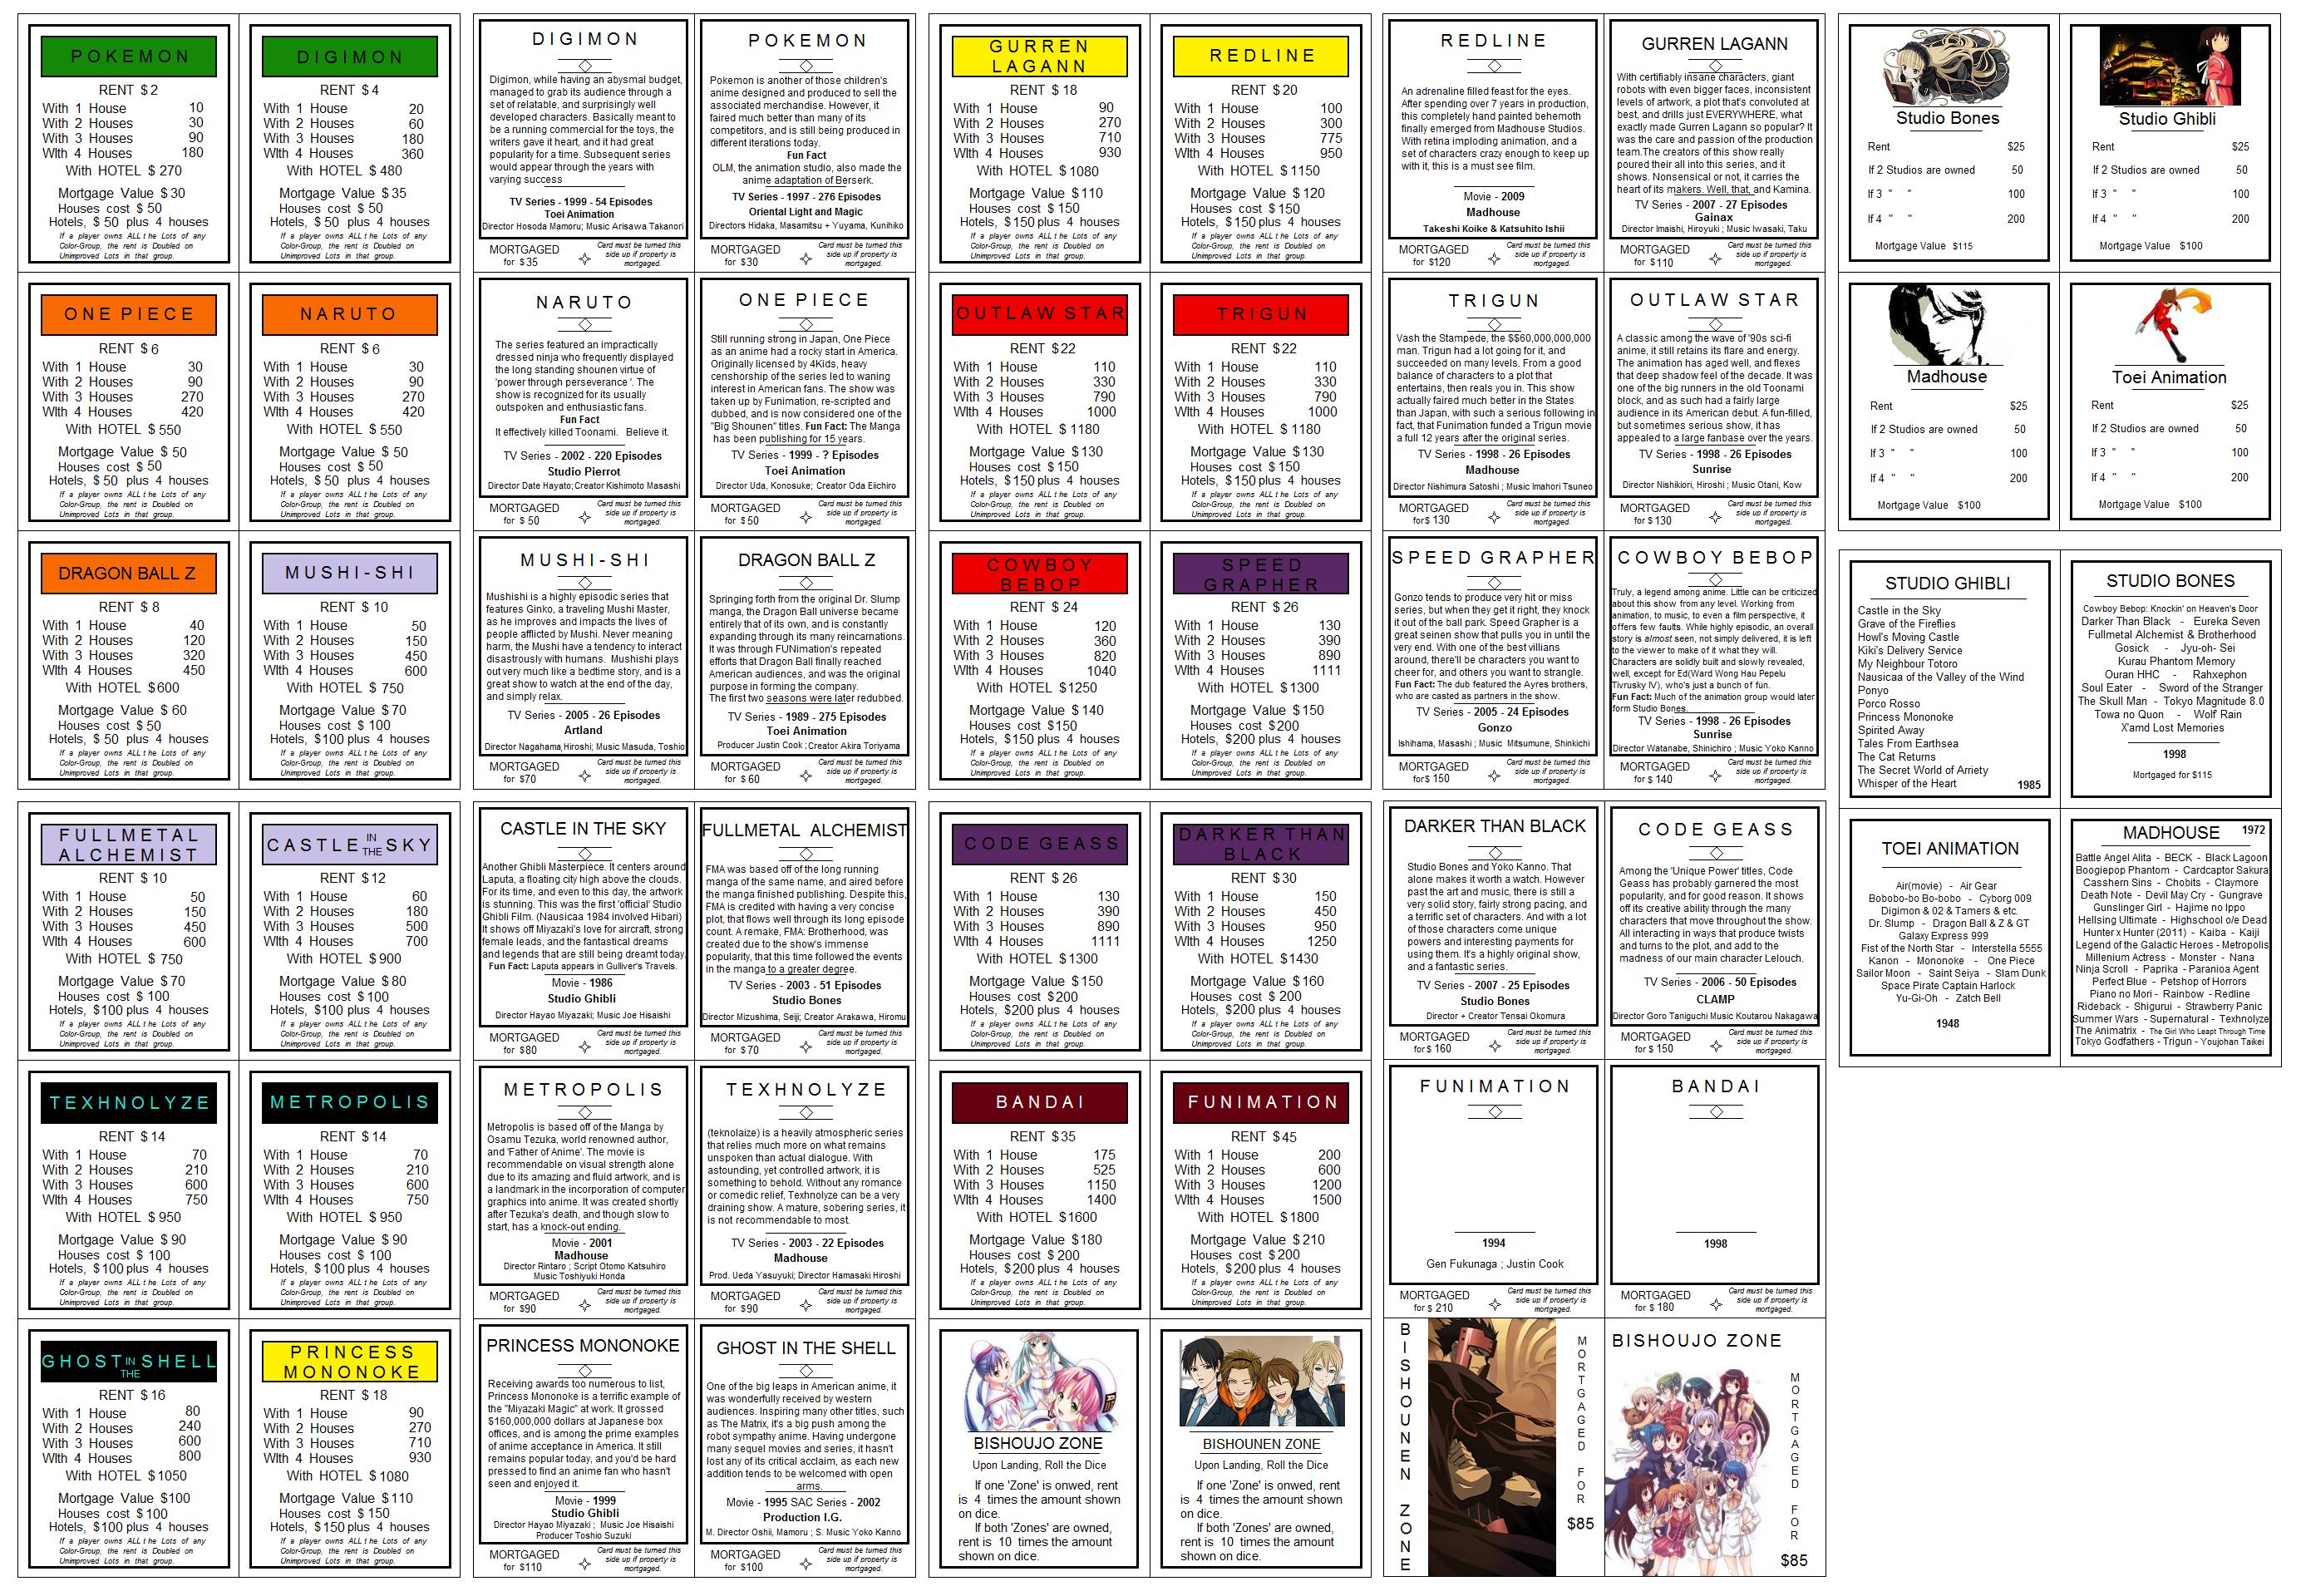 Property Cards - Anime Monopoly by ForgoneReality on DeviantArt